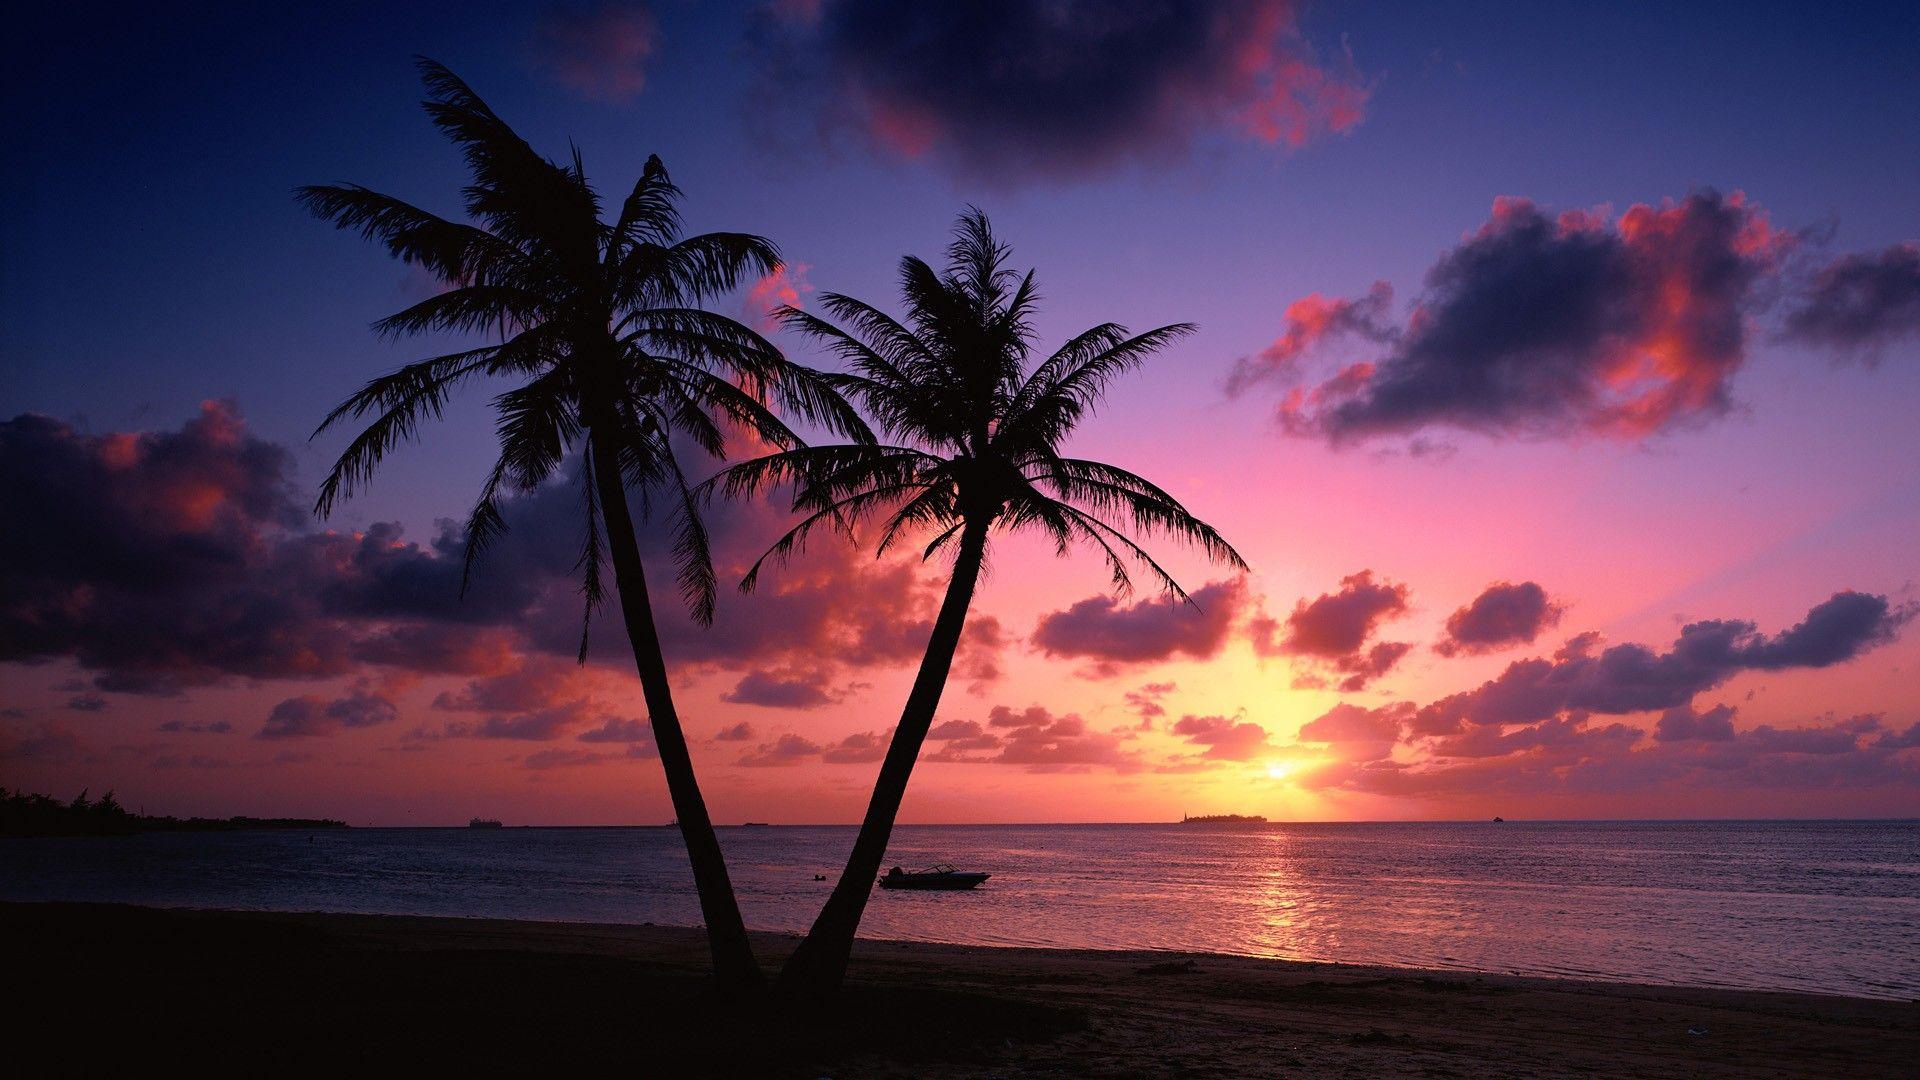 A Cliche Sunset Flickr Photos 45409013